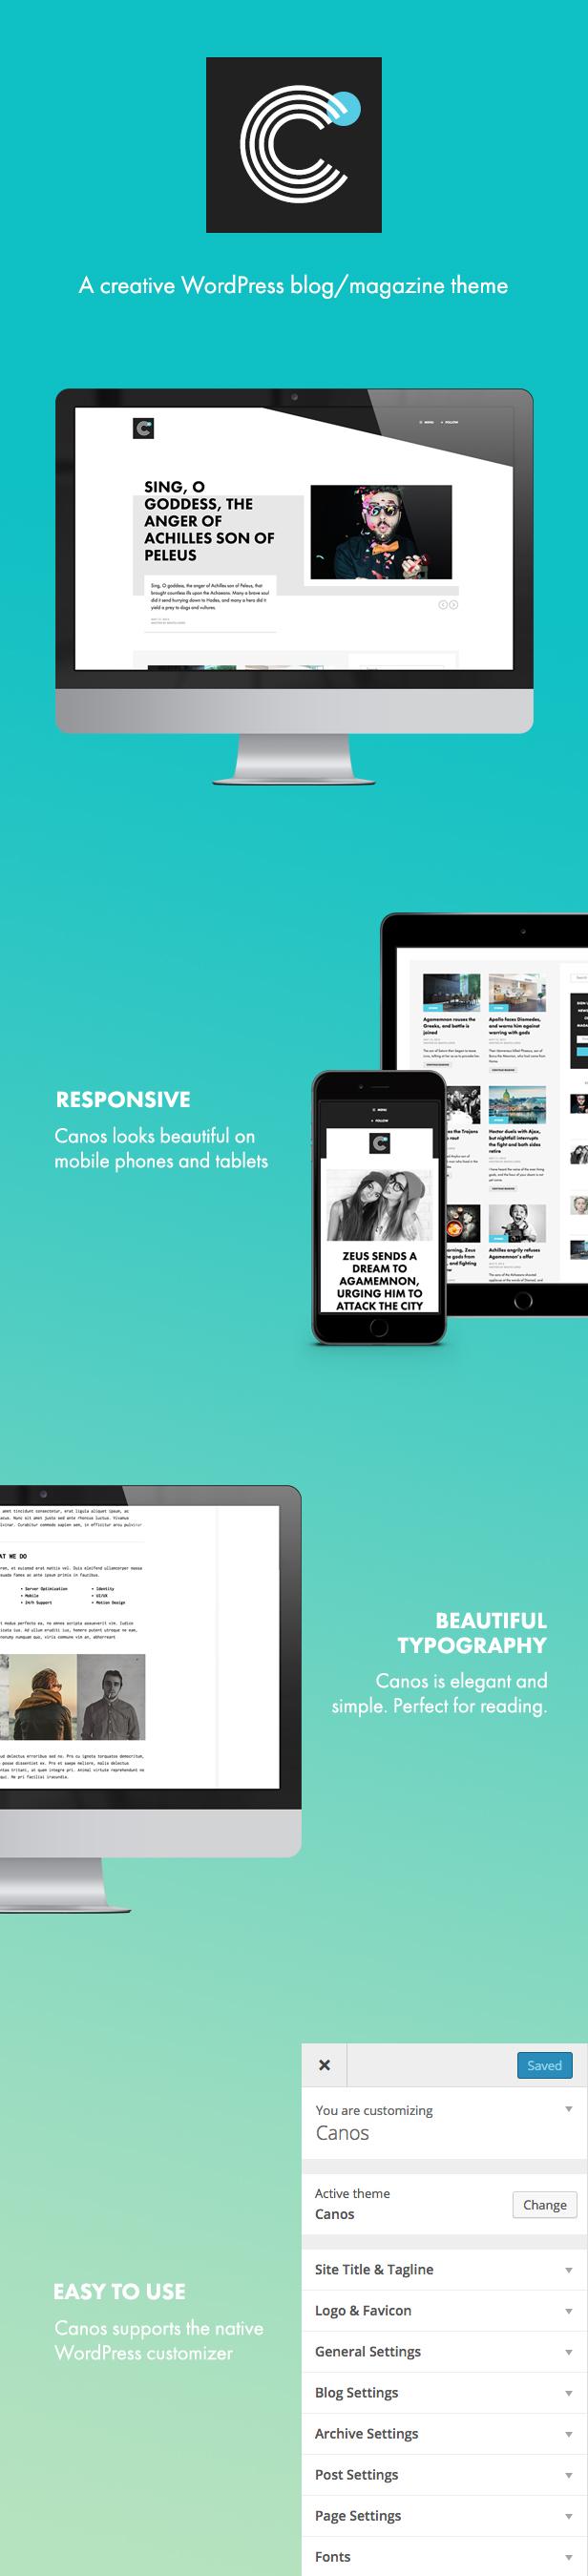 Canos - A Creative WordPress Blog Theme